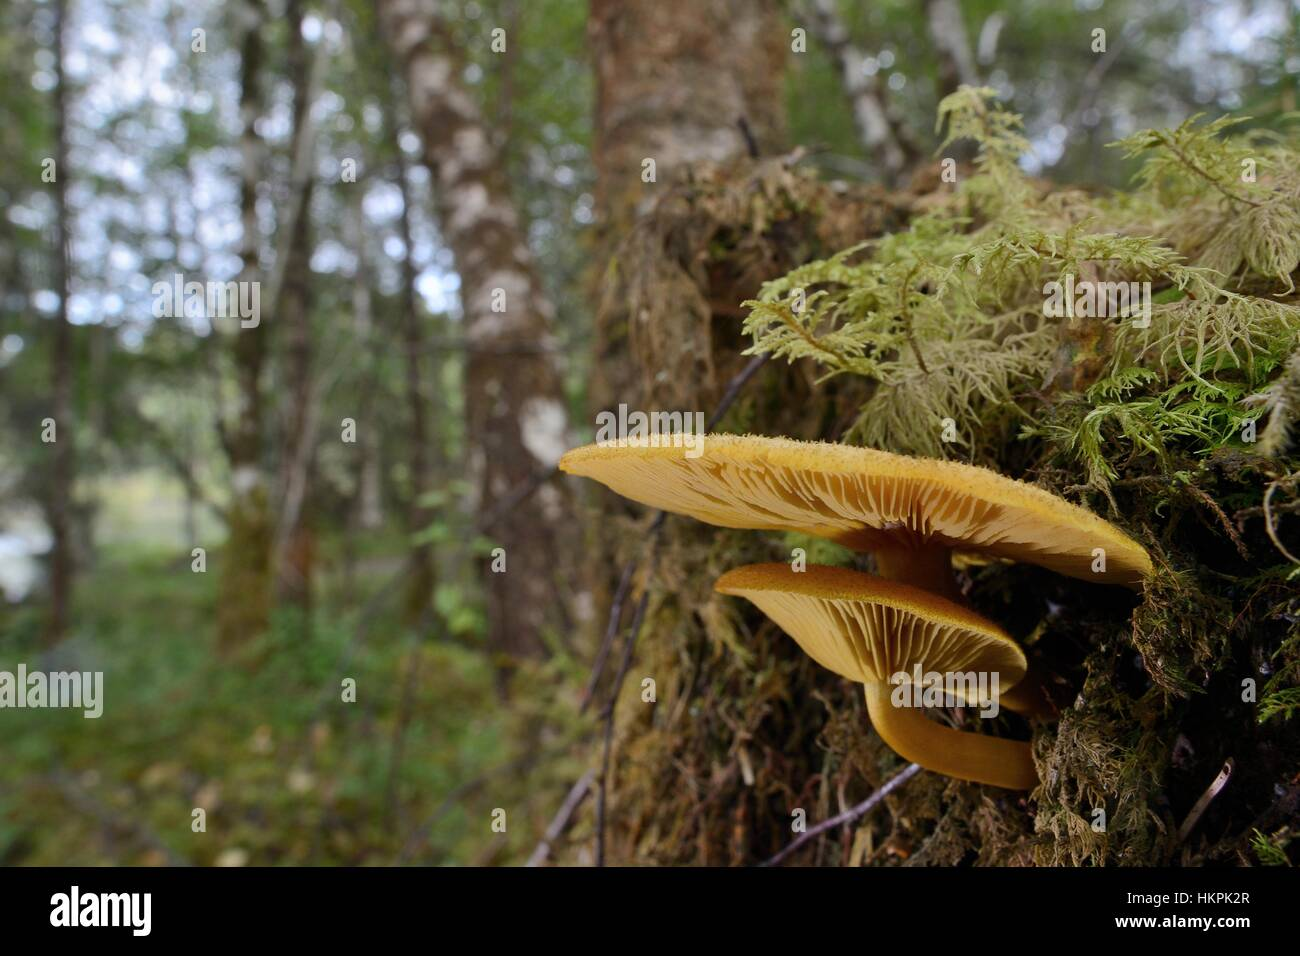 Prunes and custard (Tricholomopsis decora) mushrooms growing from a pine tree stump, Glengarry forest, Lochaber, - Stock Image